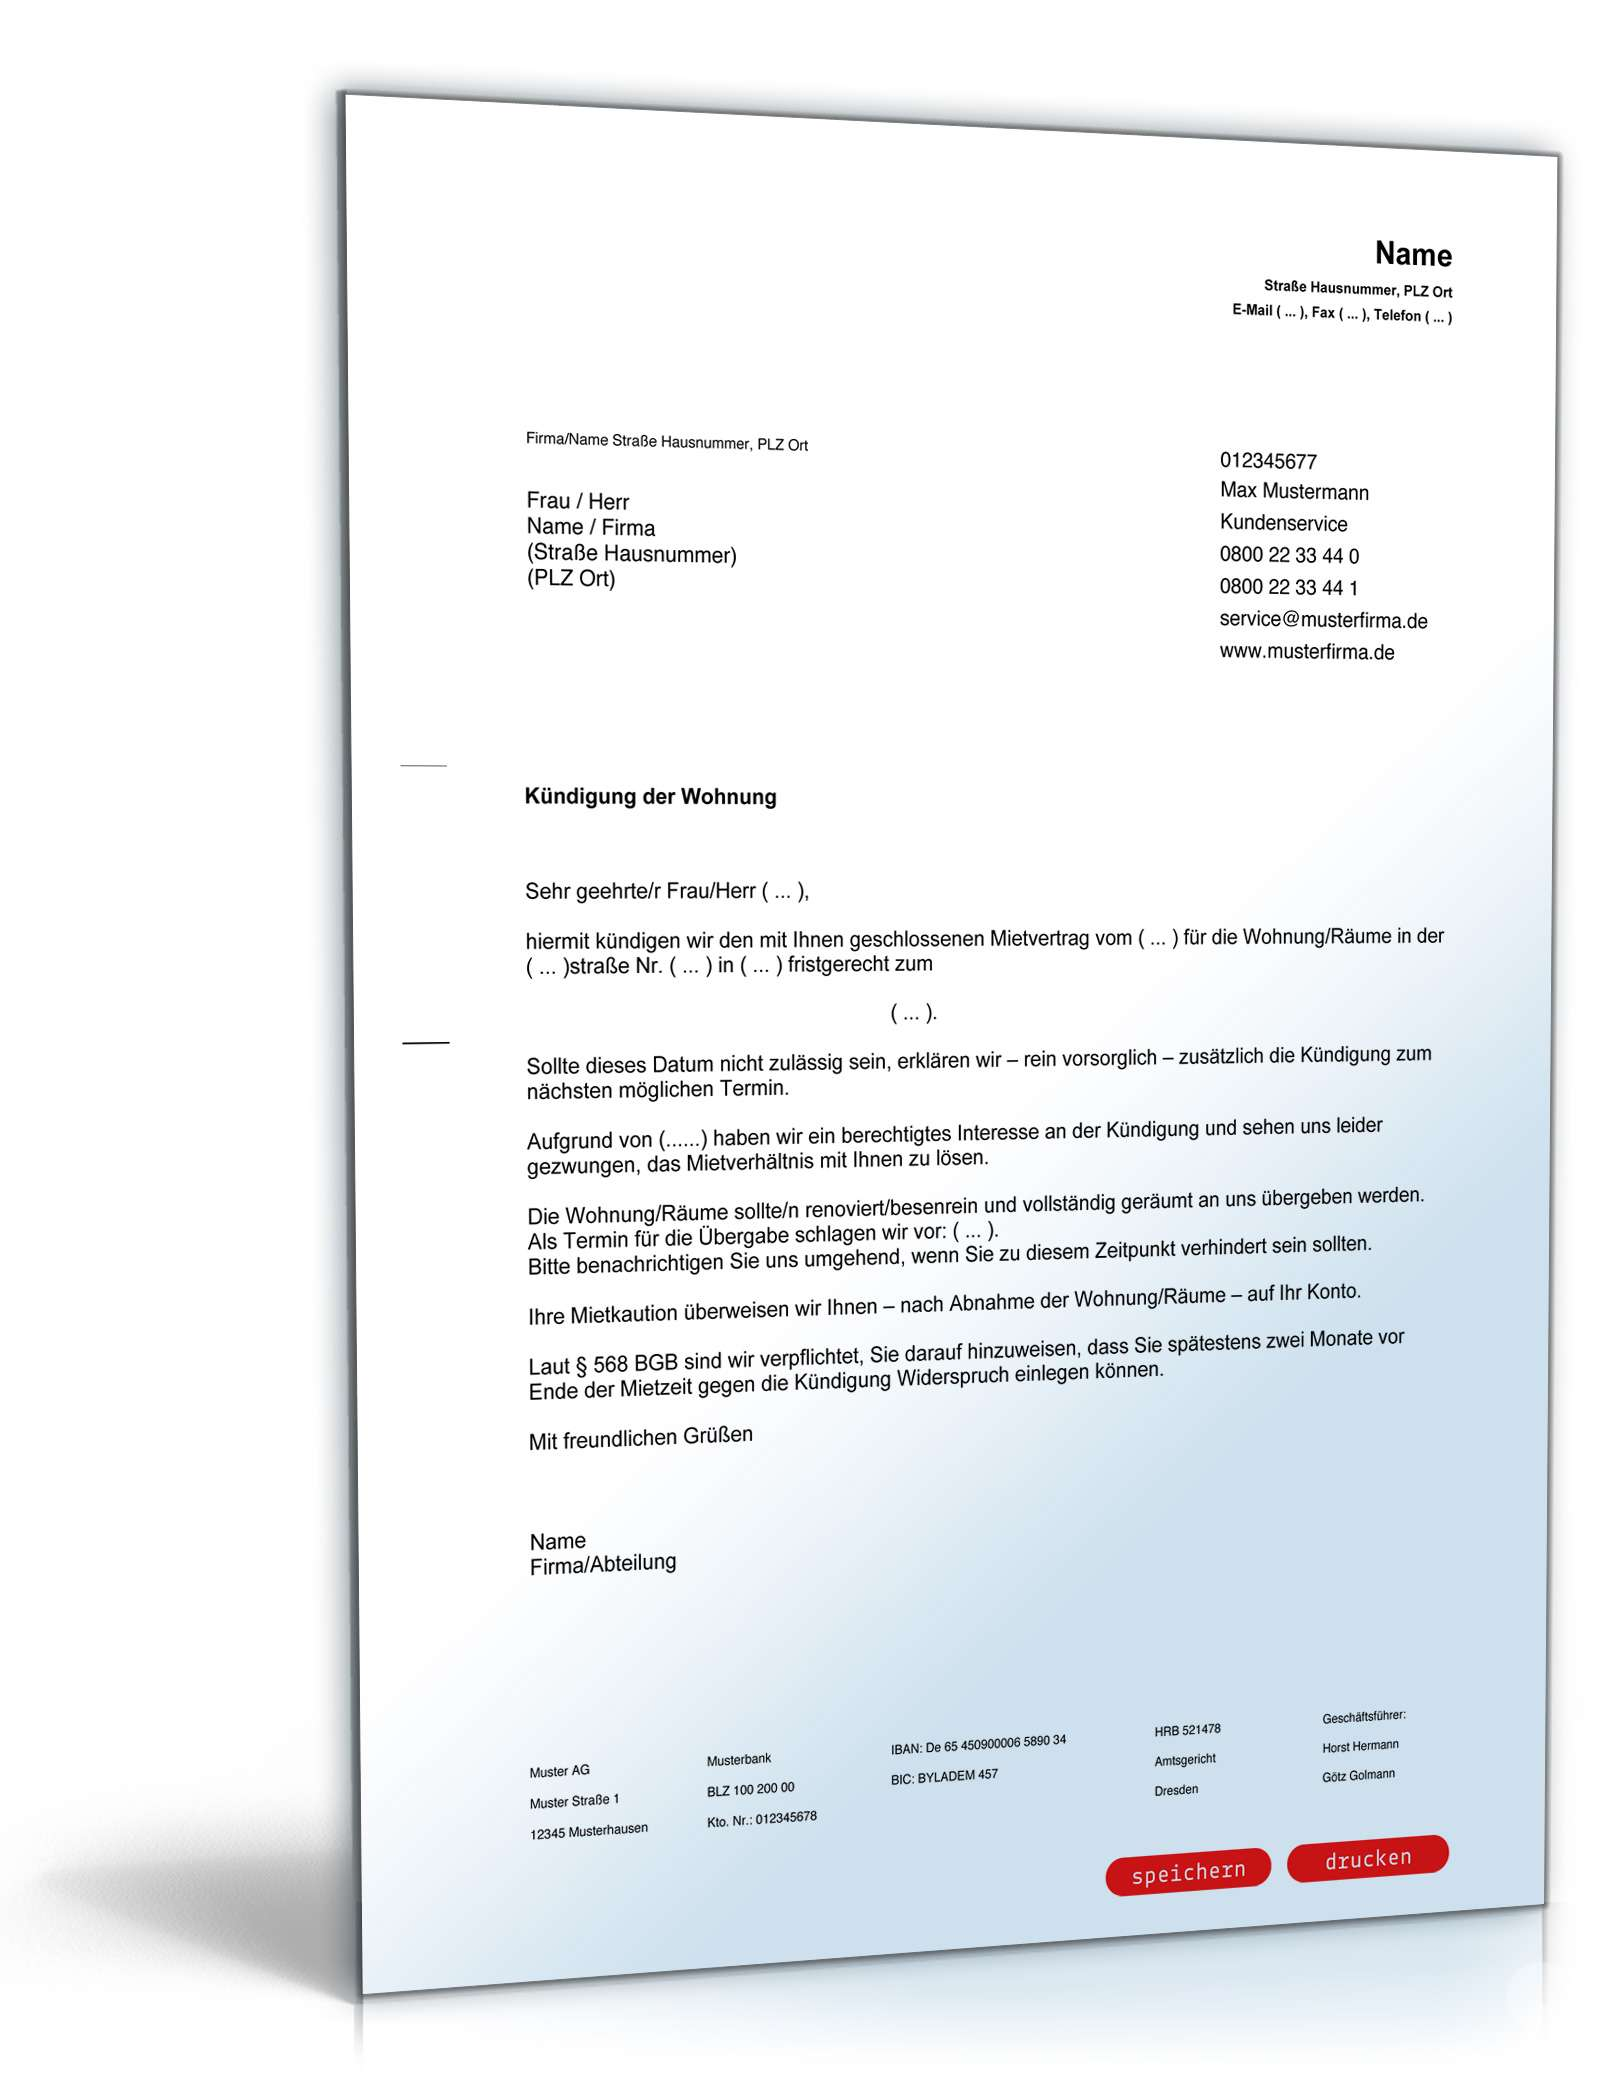 Fristgemäße Kündigung Mietvertrag durch Vermieter